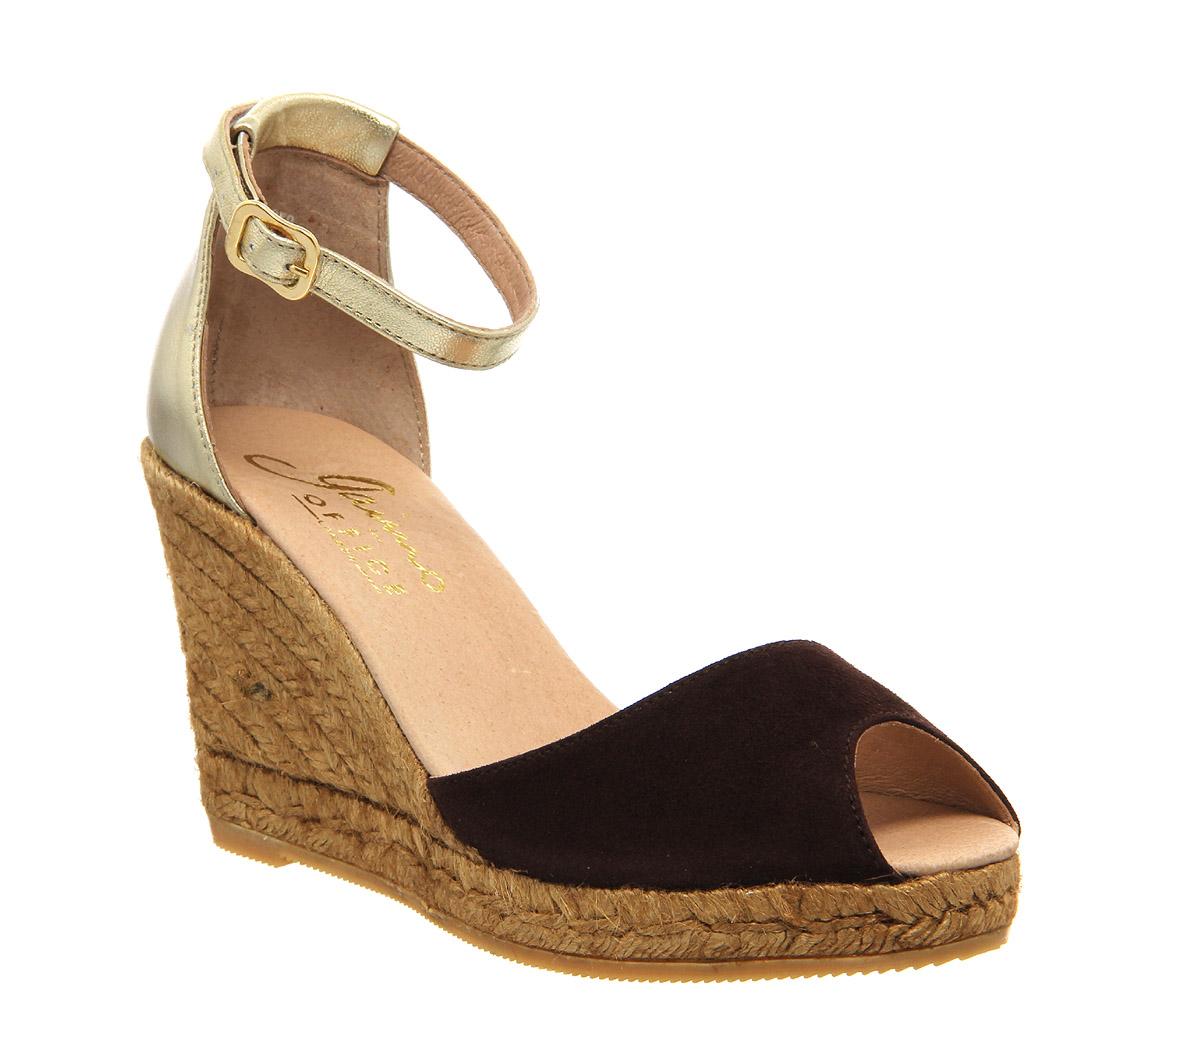 Gaimo Shoes Sale